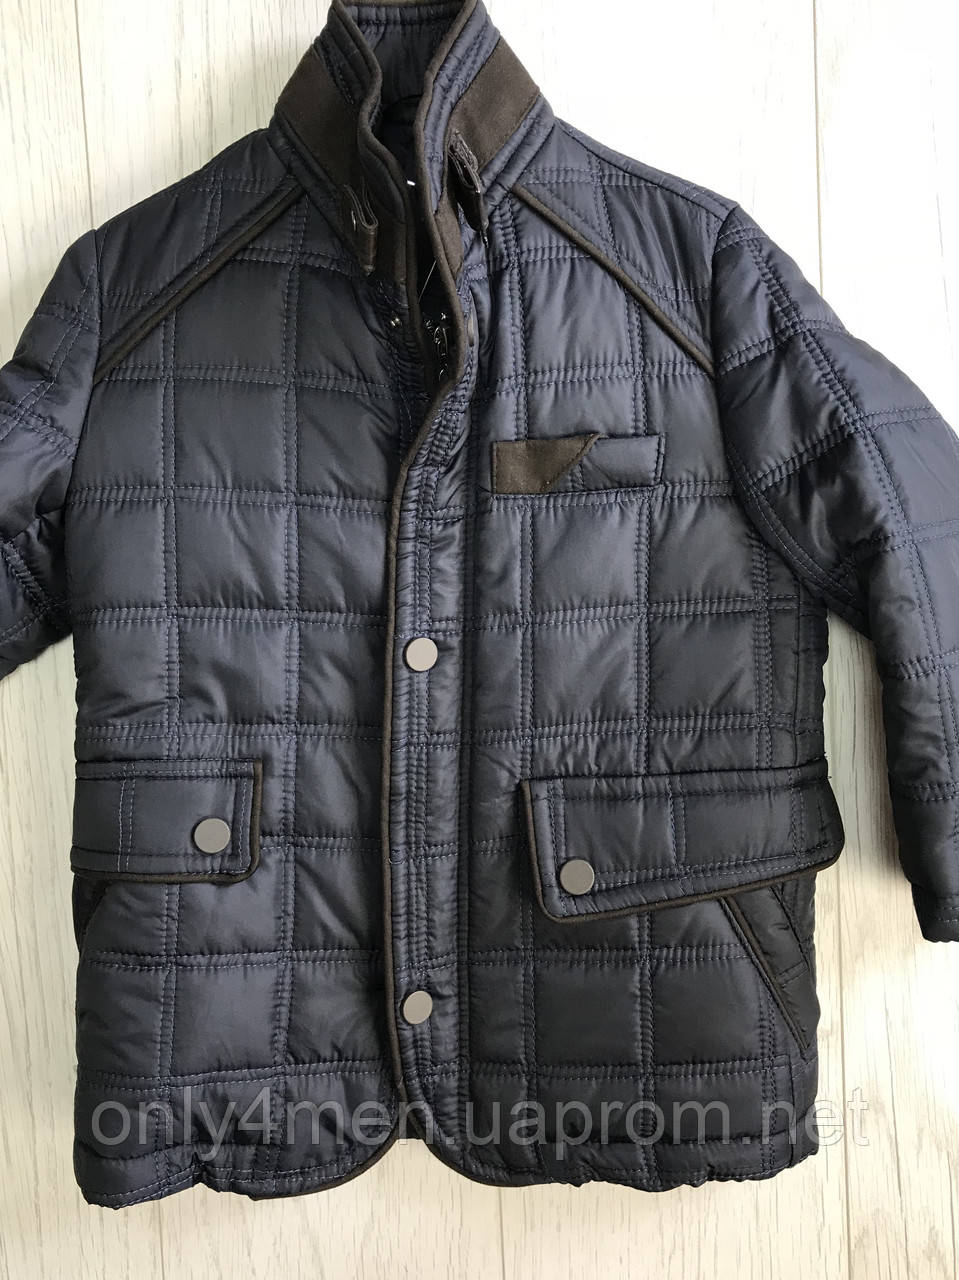 Куртка для хлопчика на ріст 98см.